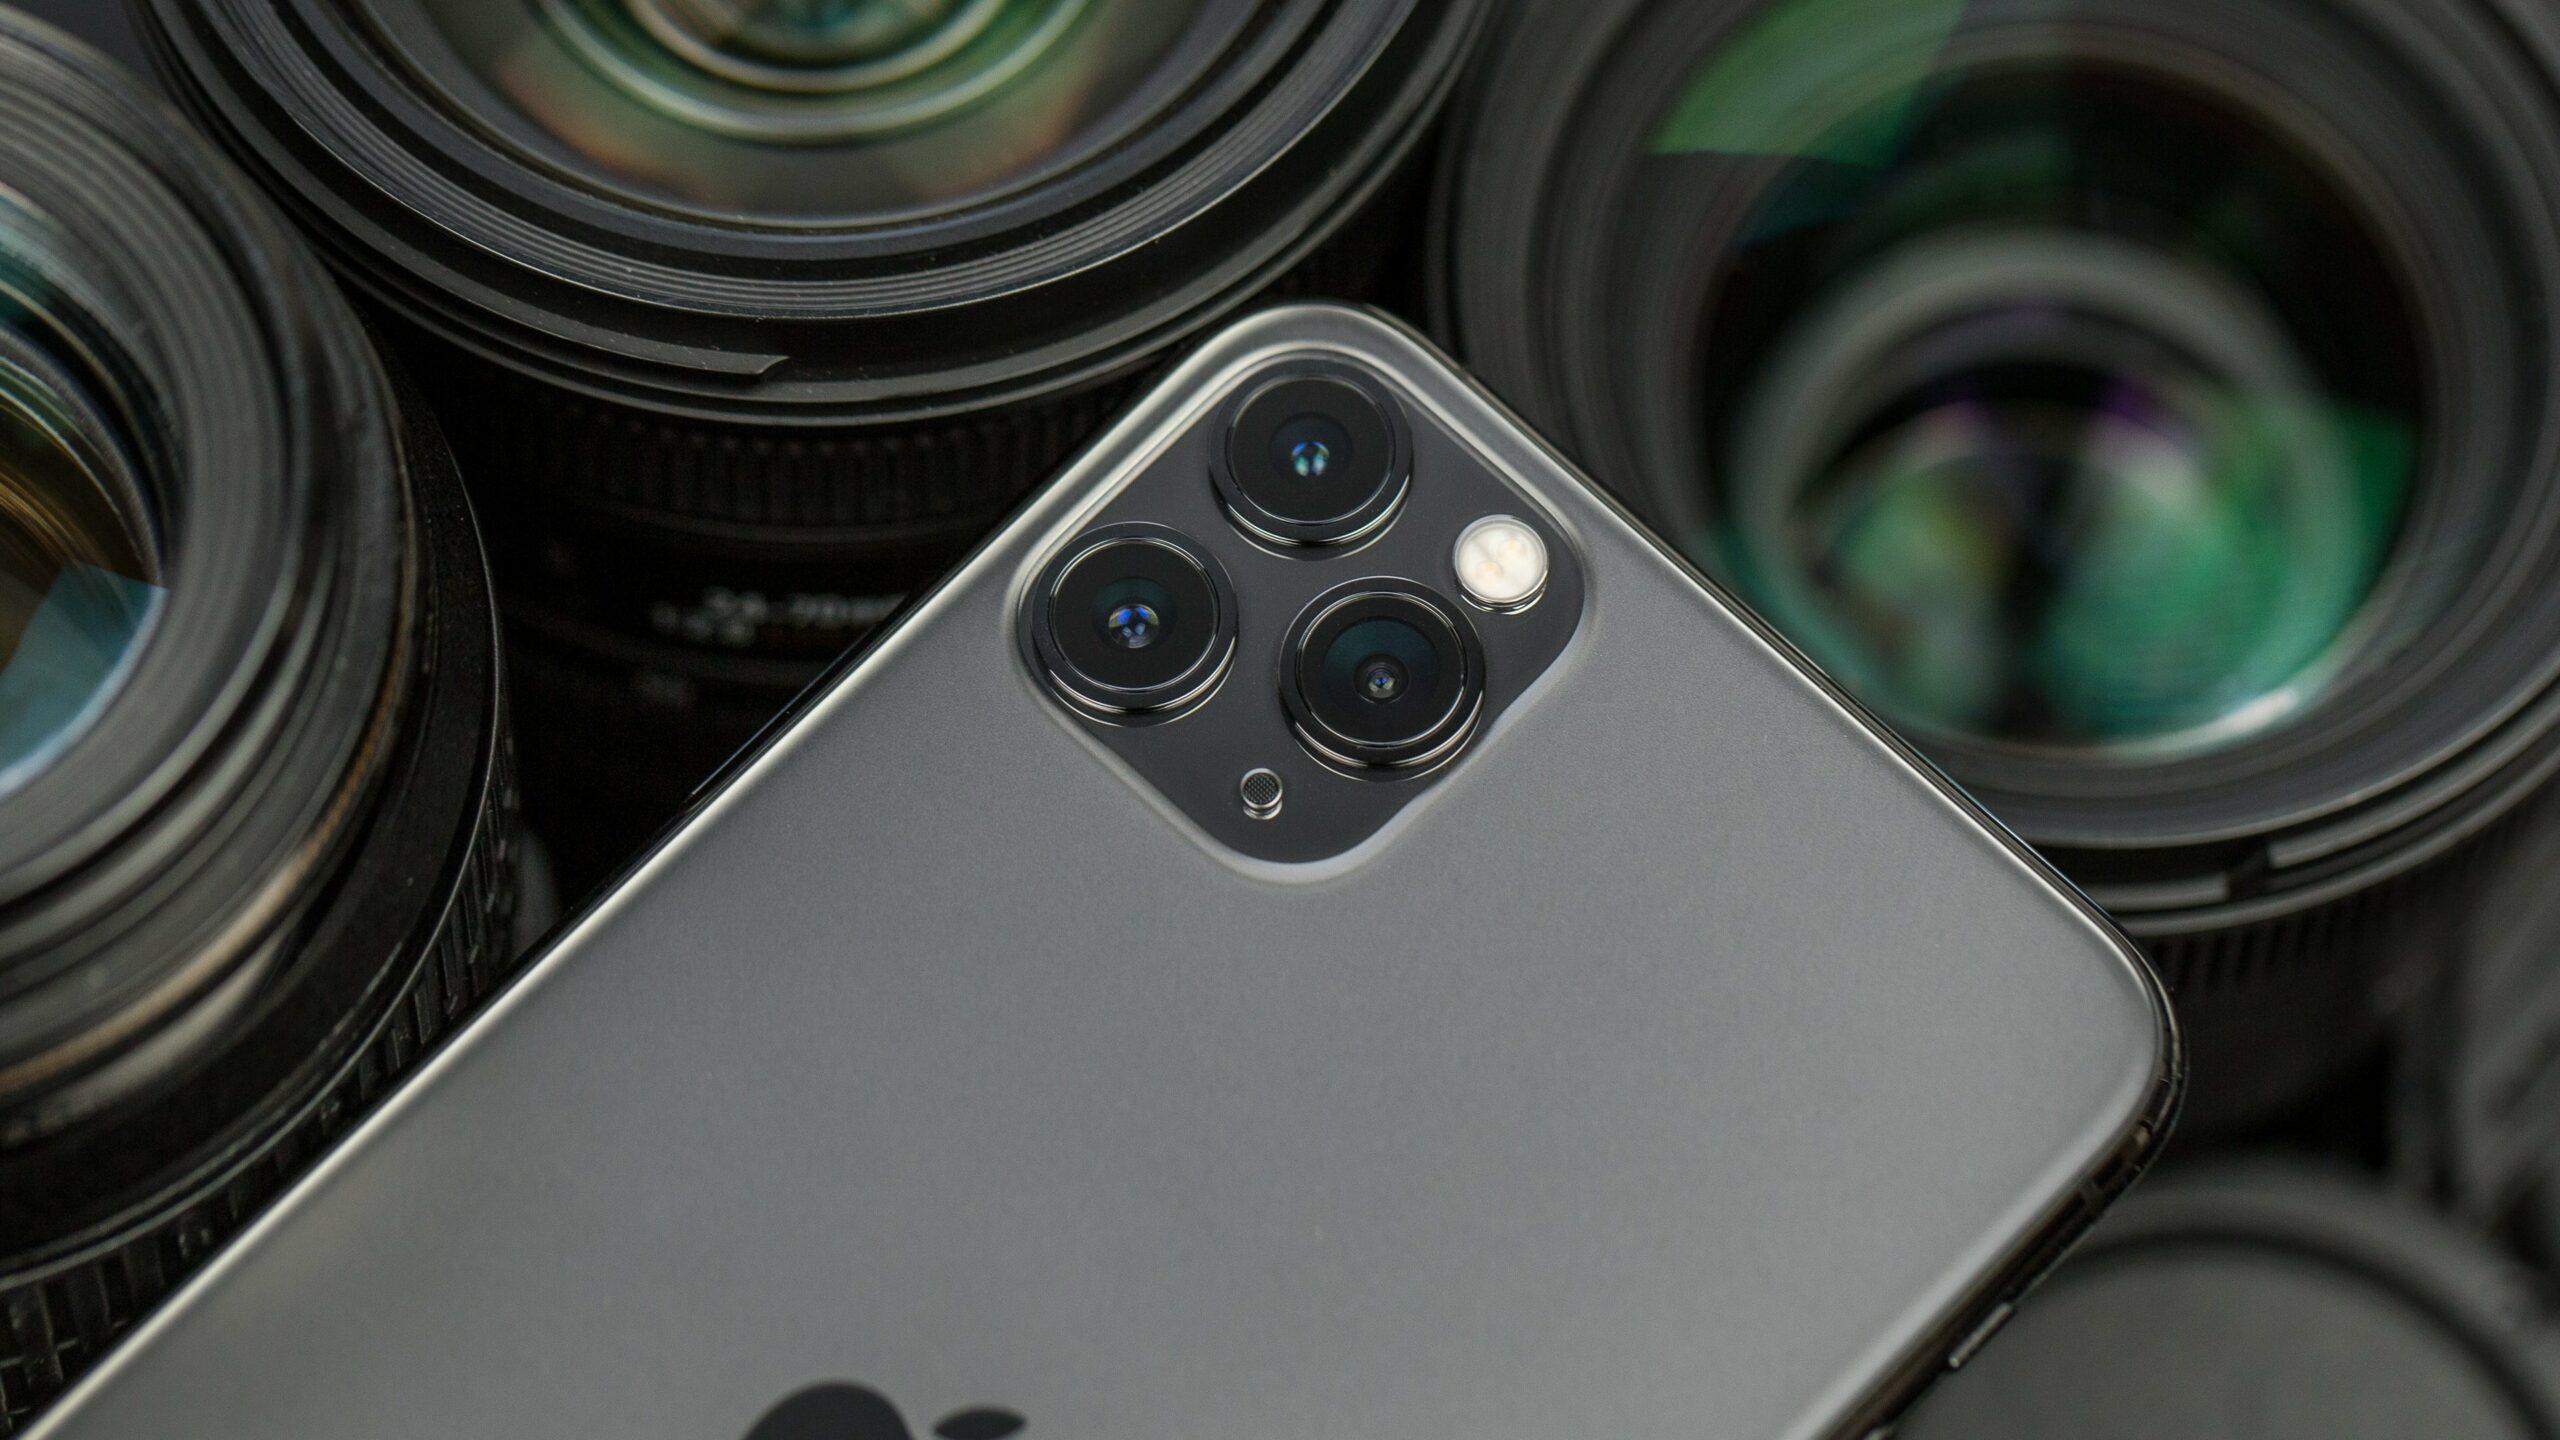 Photo of Советы и рекомендации по работе с камерой для Apple iPhone 11 и iPhone 11 Pro Max